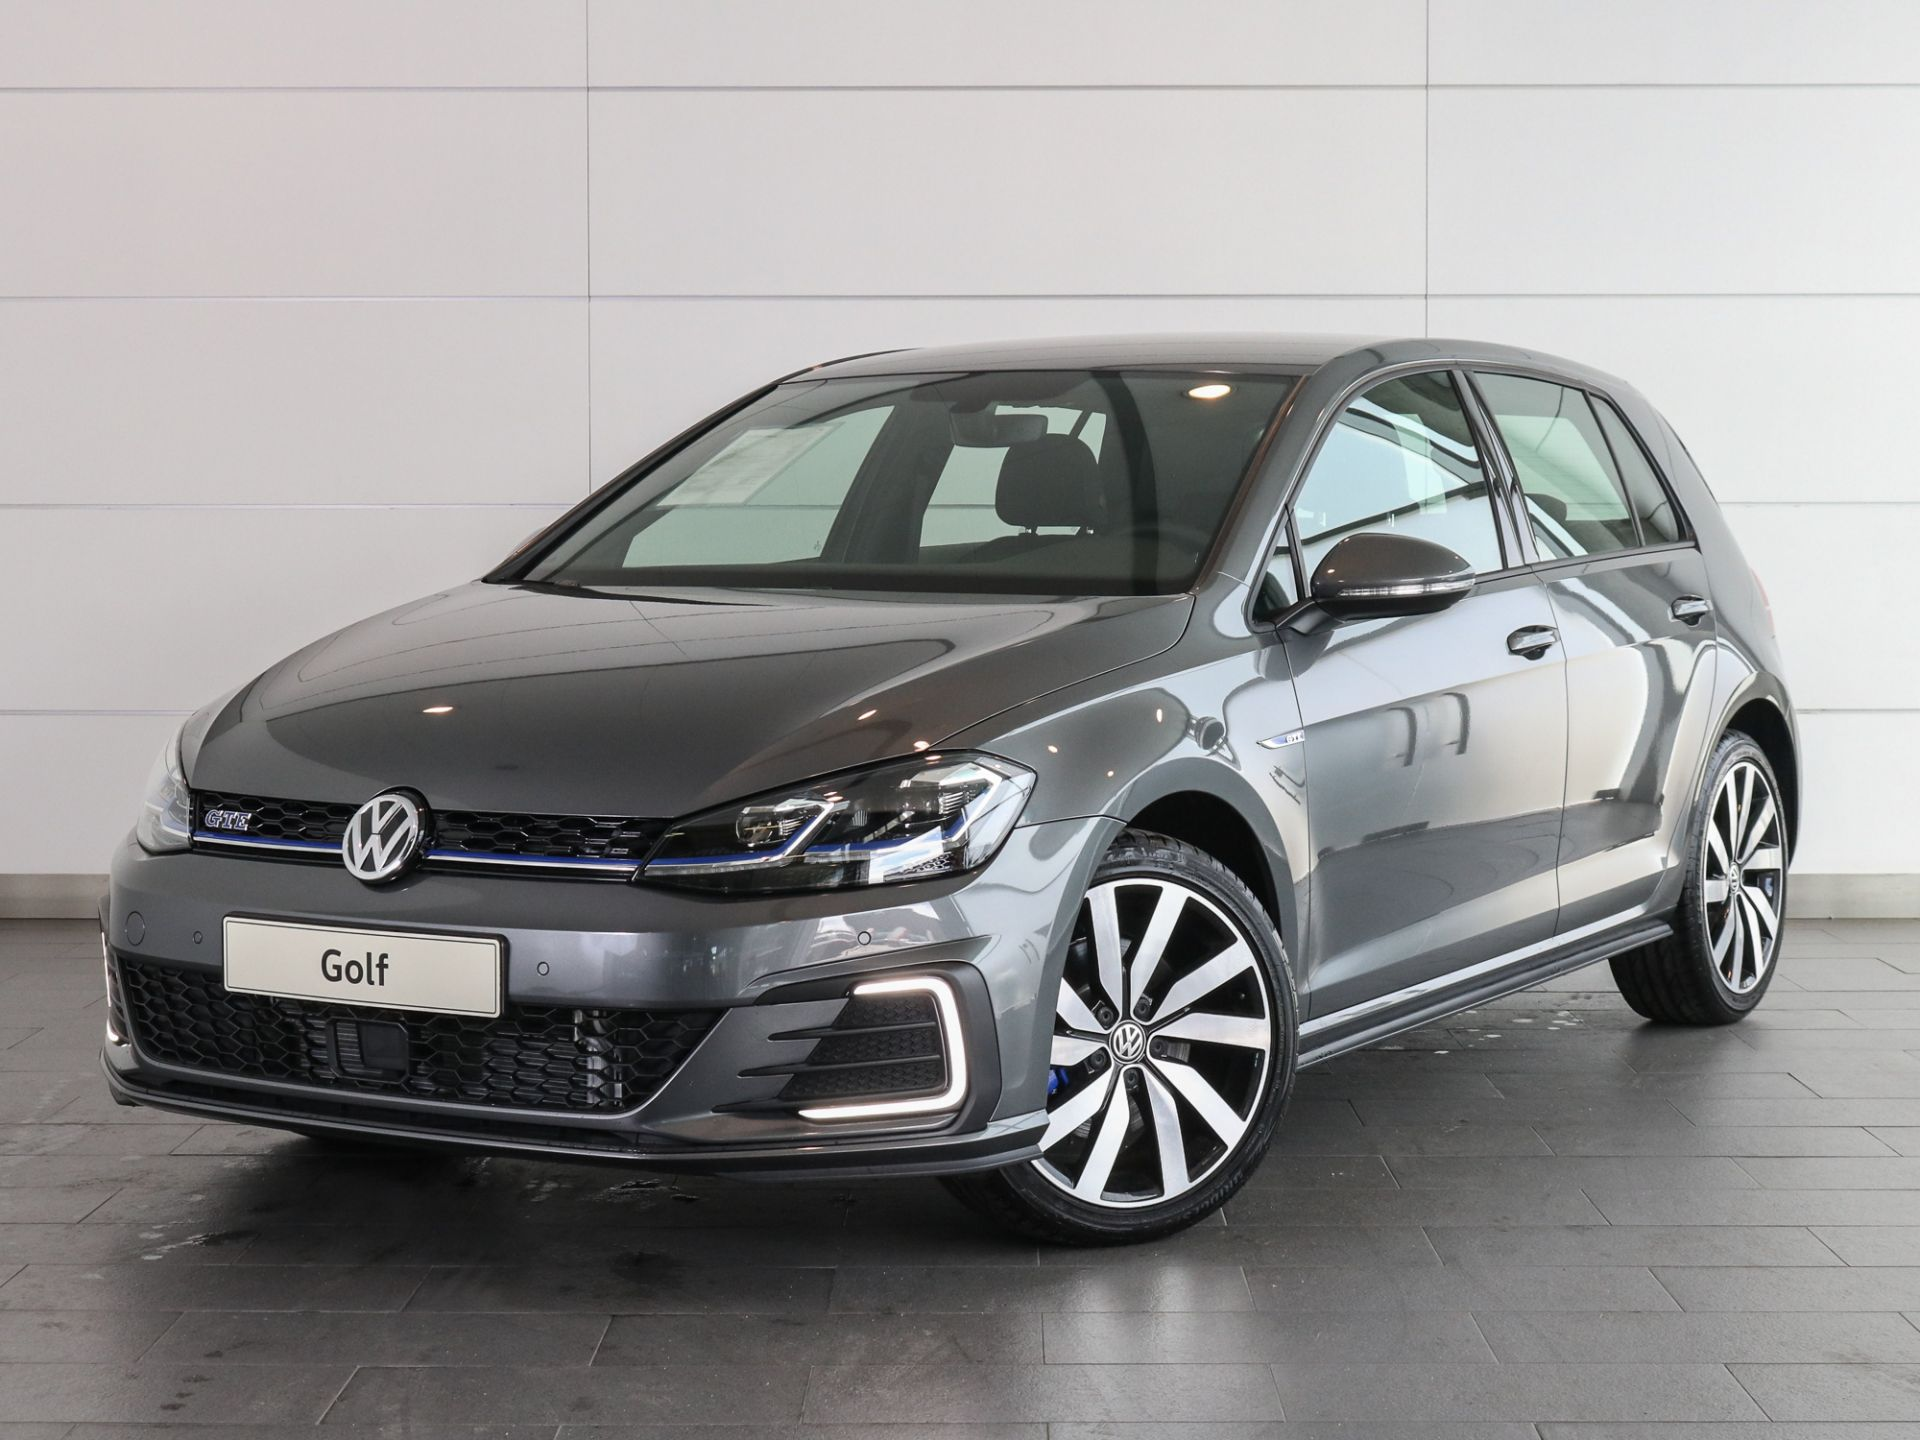 Volkswagen Golf 1.4 TSI DSG GTE Plug-In Hybrid 204cv segunda mão Setúbal